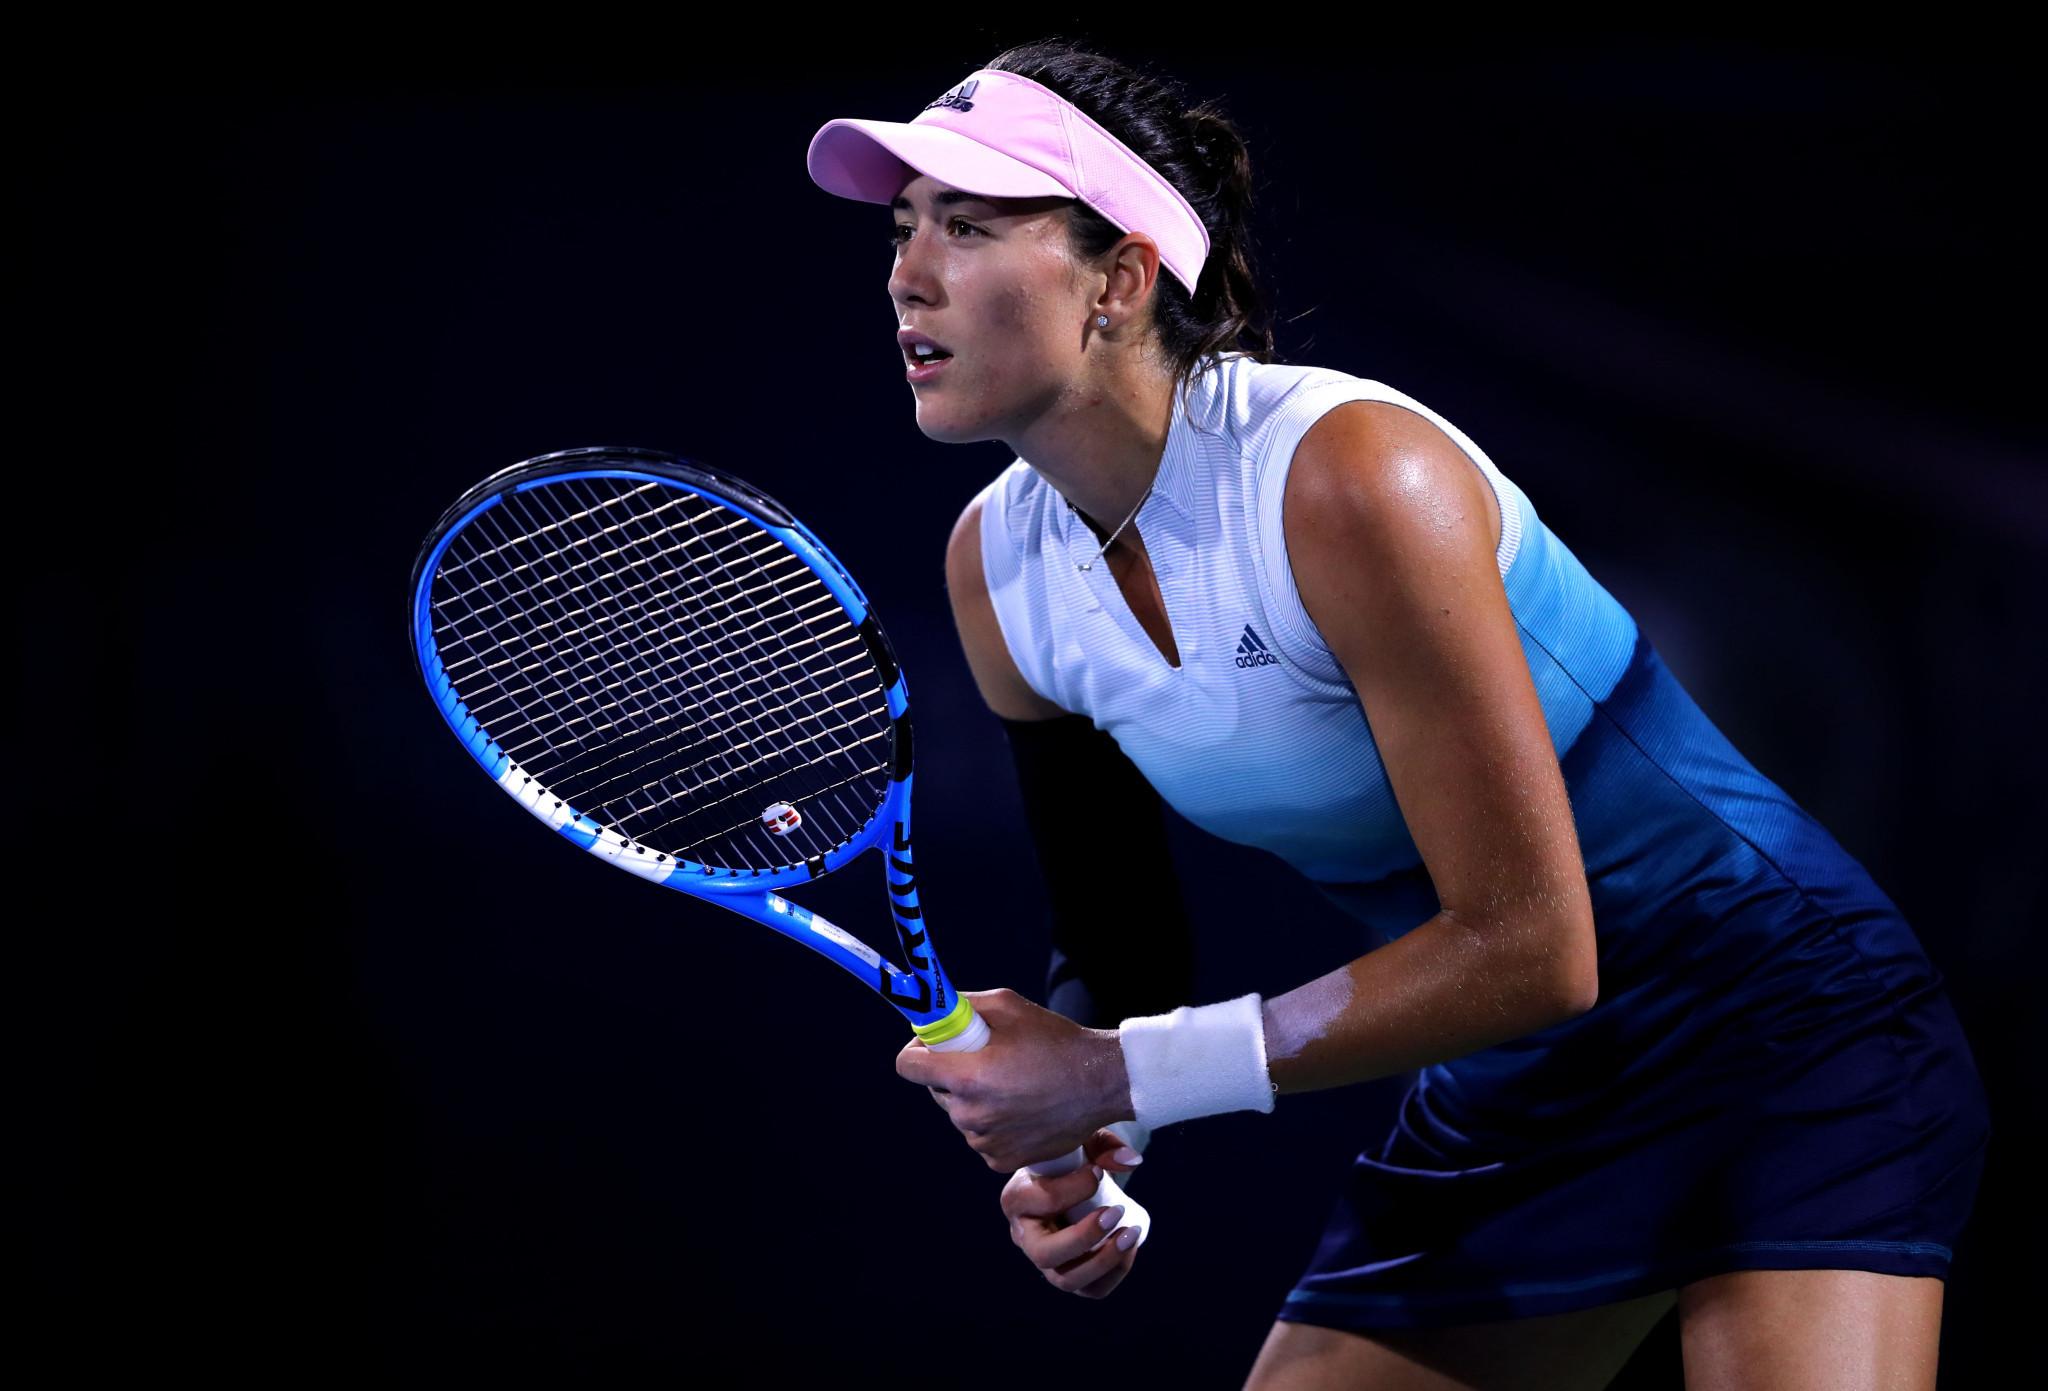 Dubai Tennis Championships begins with victory for Muguruza